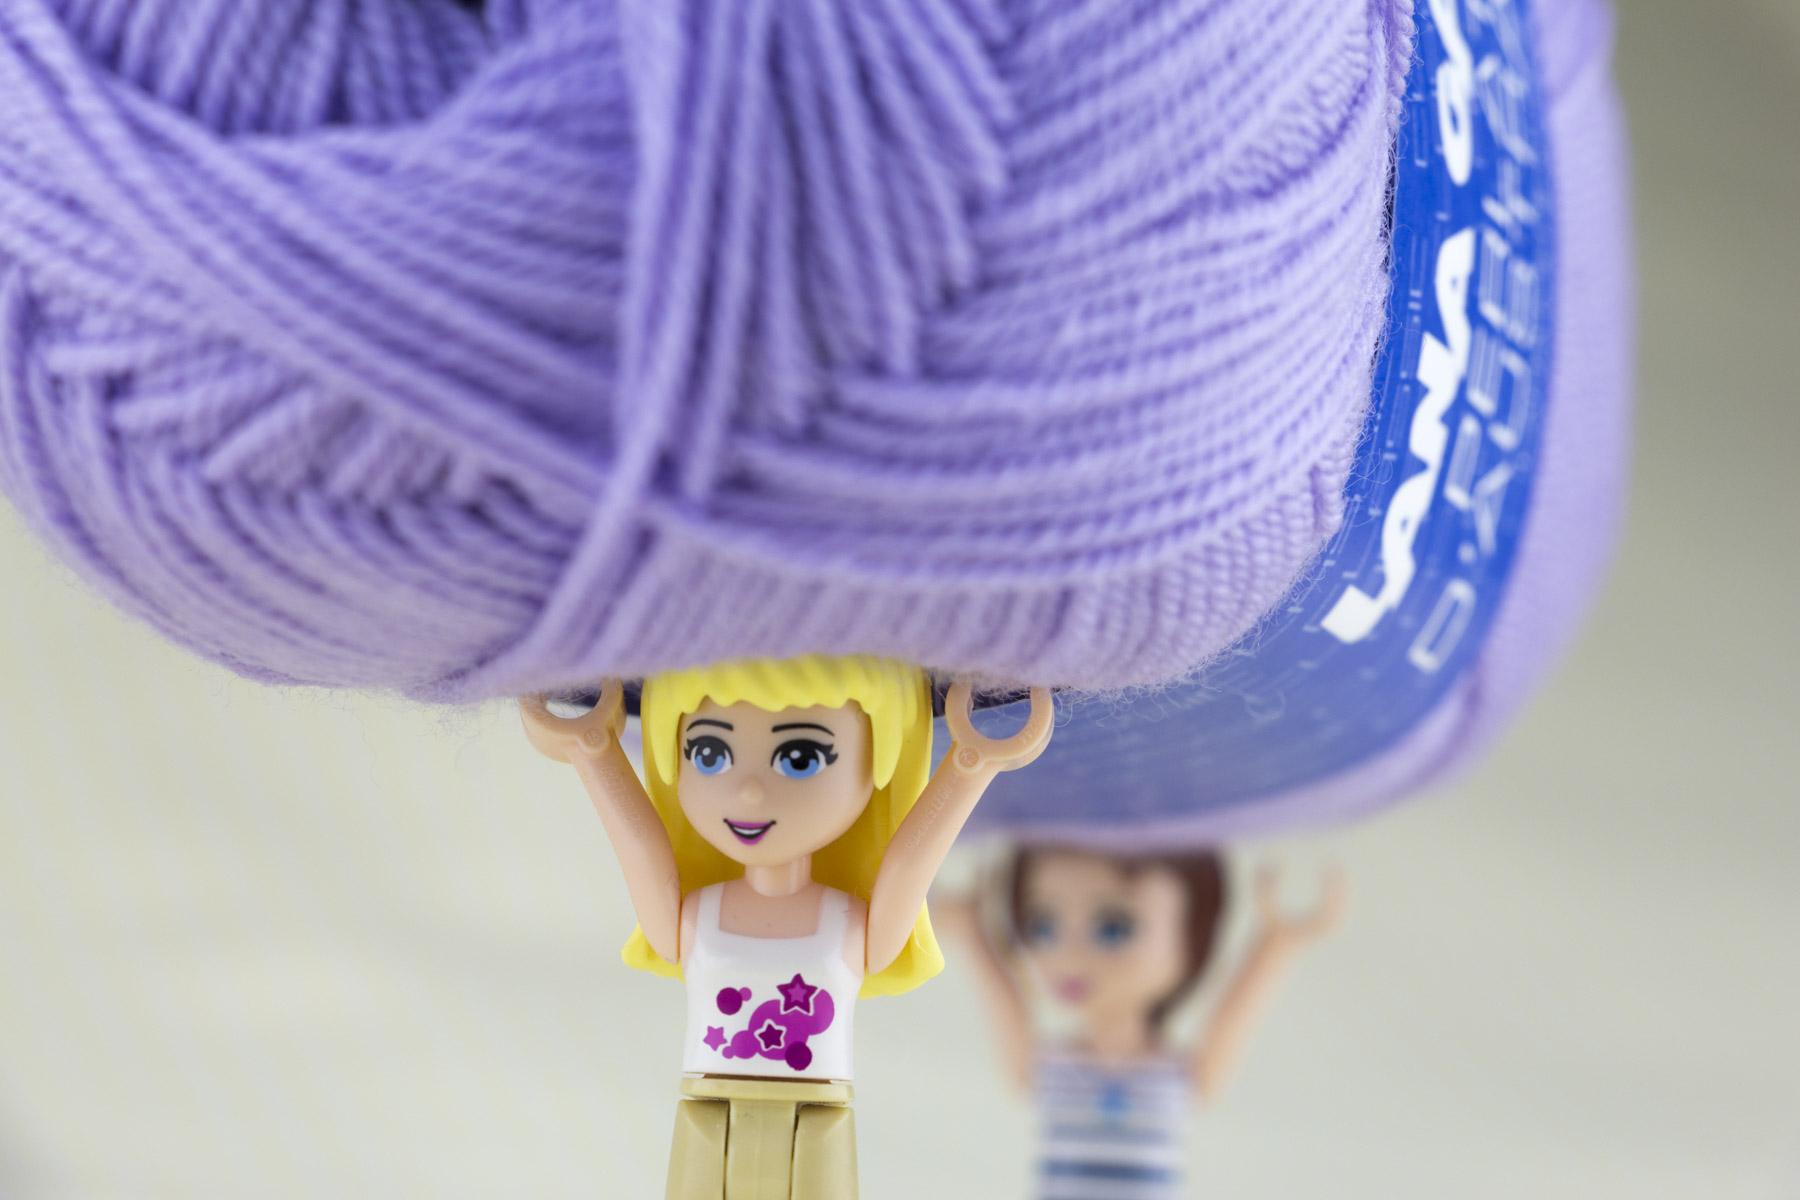 Fire de tricotat Lana Gatto